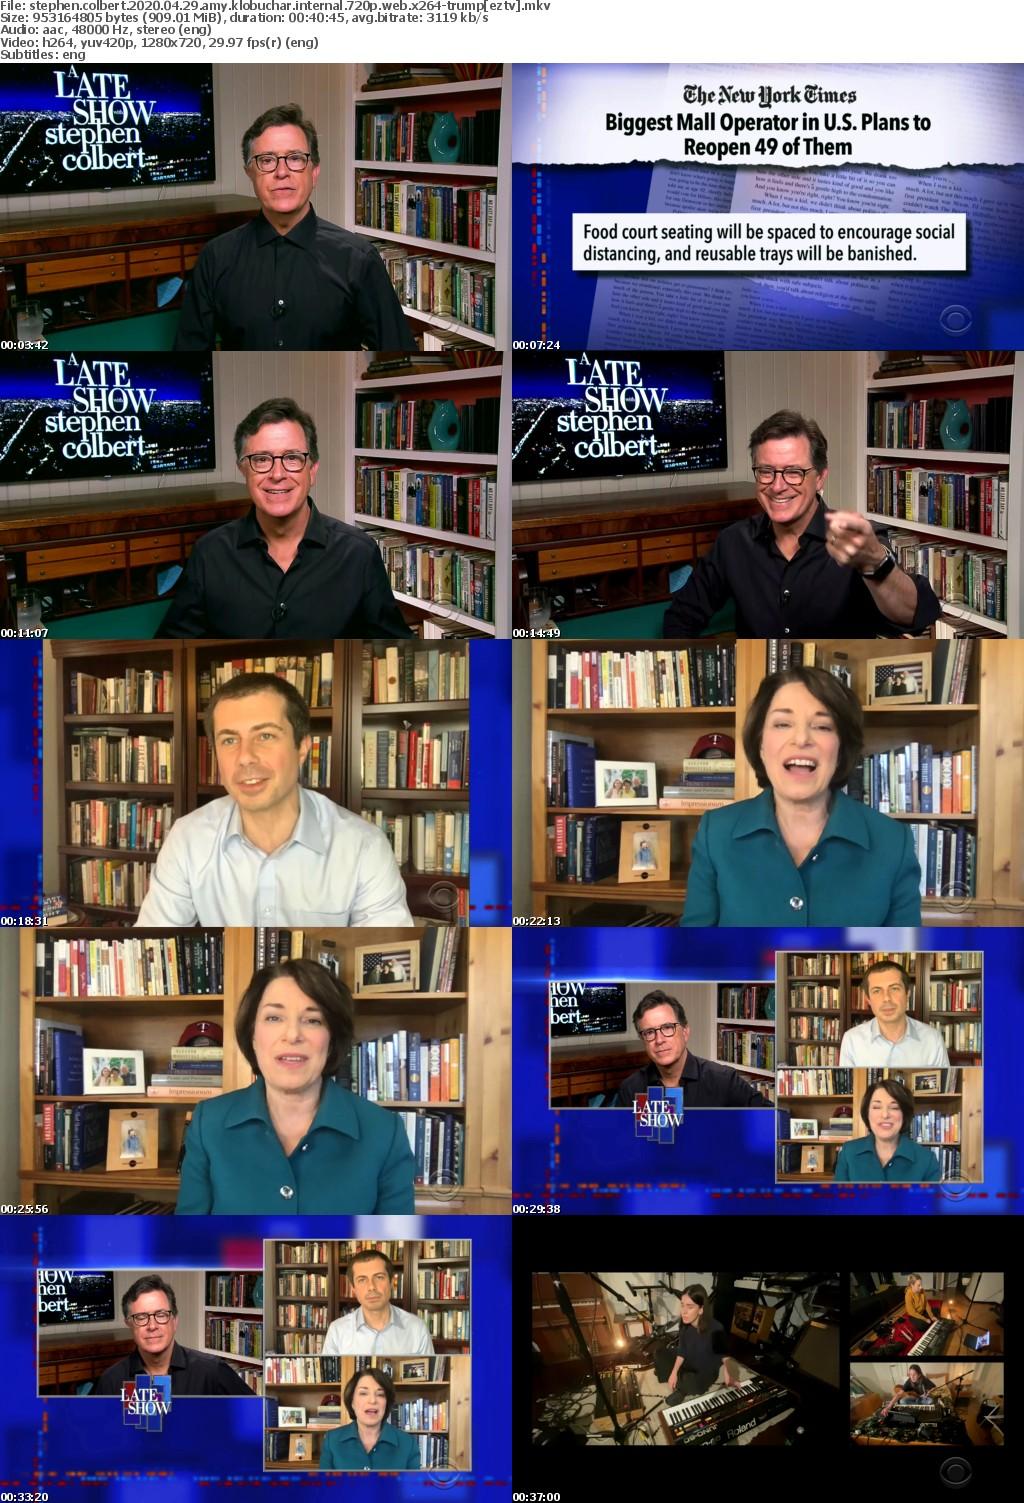 Stephen Colbert 2020 04 29 Amy Klobuchar iNTERNAL 720p WEB x264-TRUMP